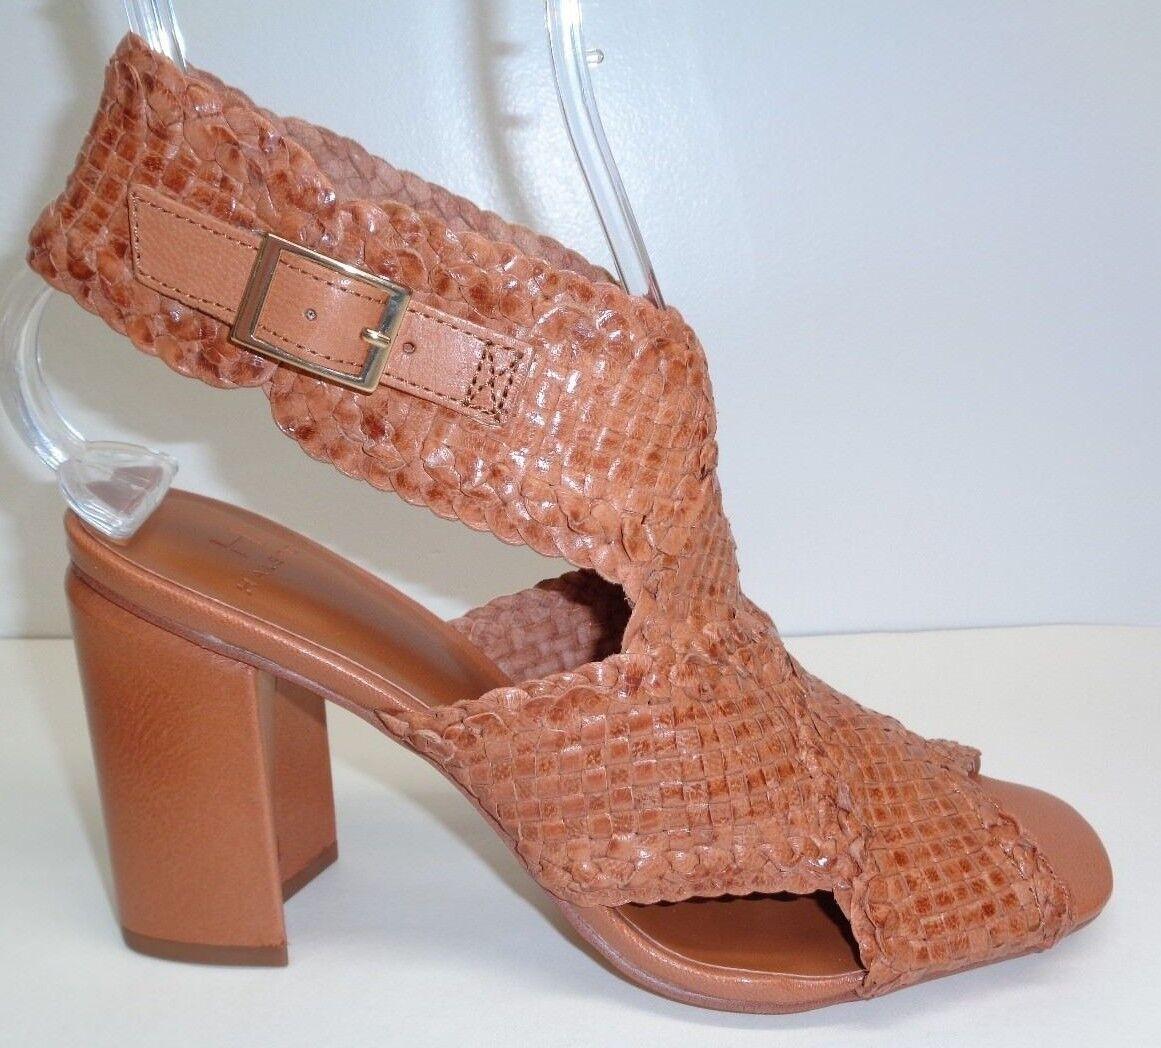 H Halston Größe 10 M PENELOPE Braun Woven Leder Heels Sandales NEU Damenschuhe Schuhes